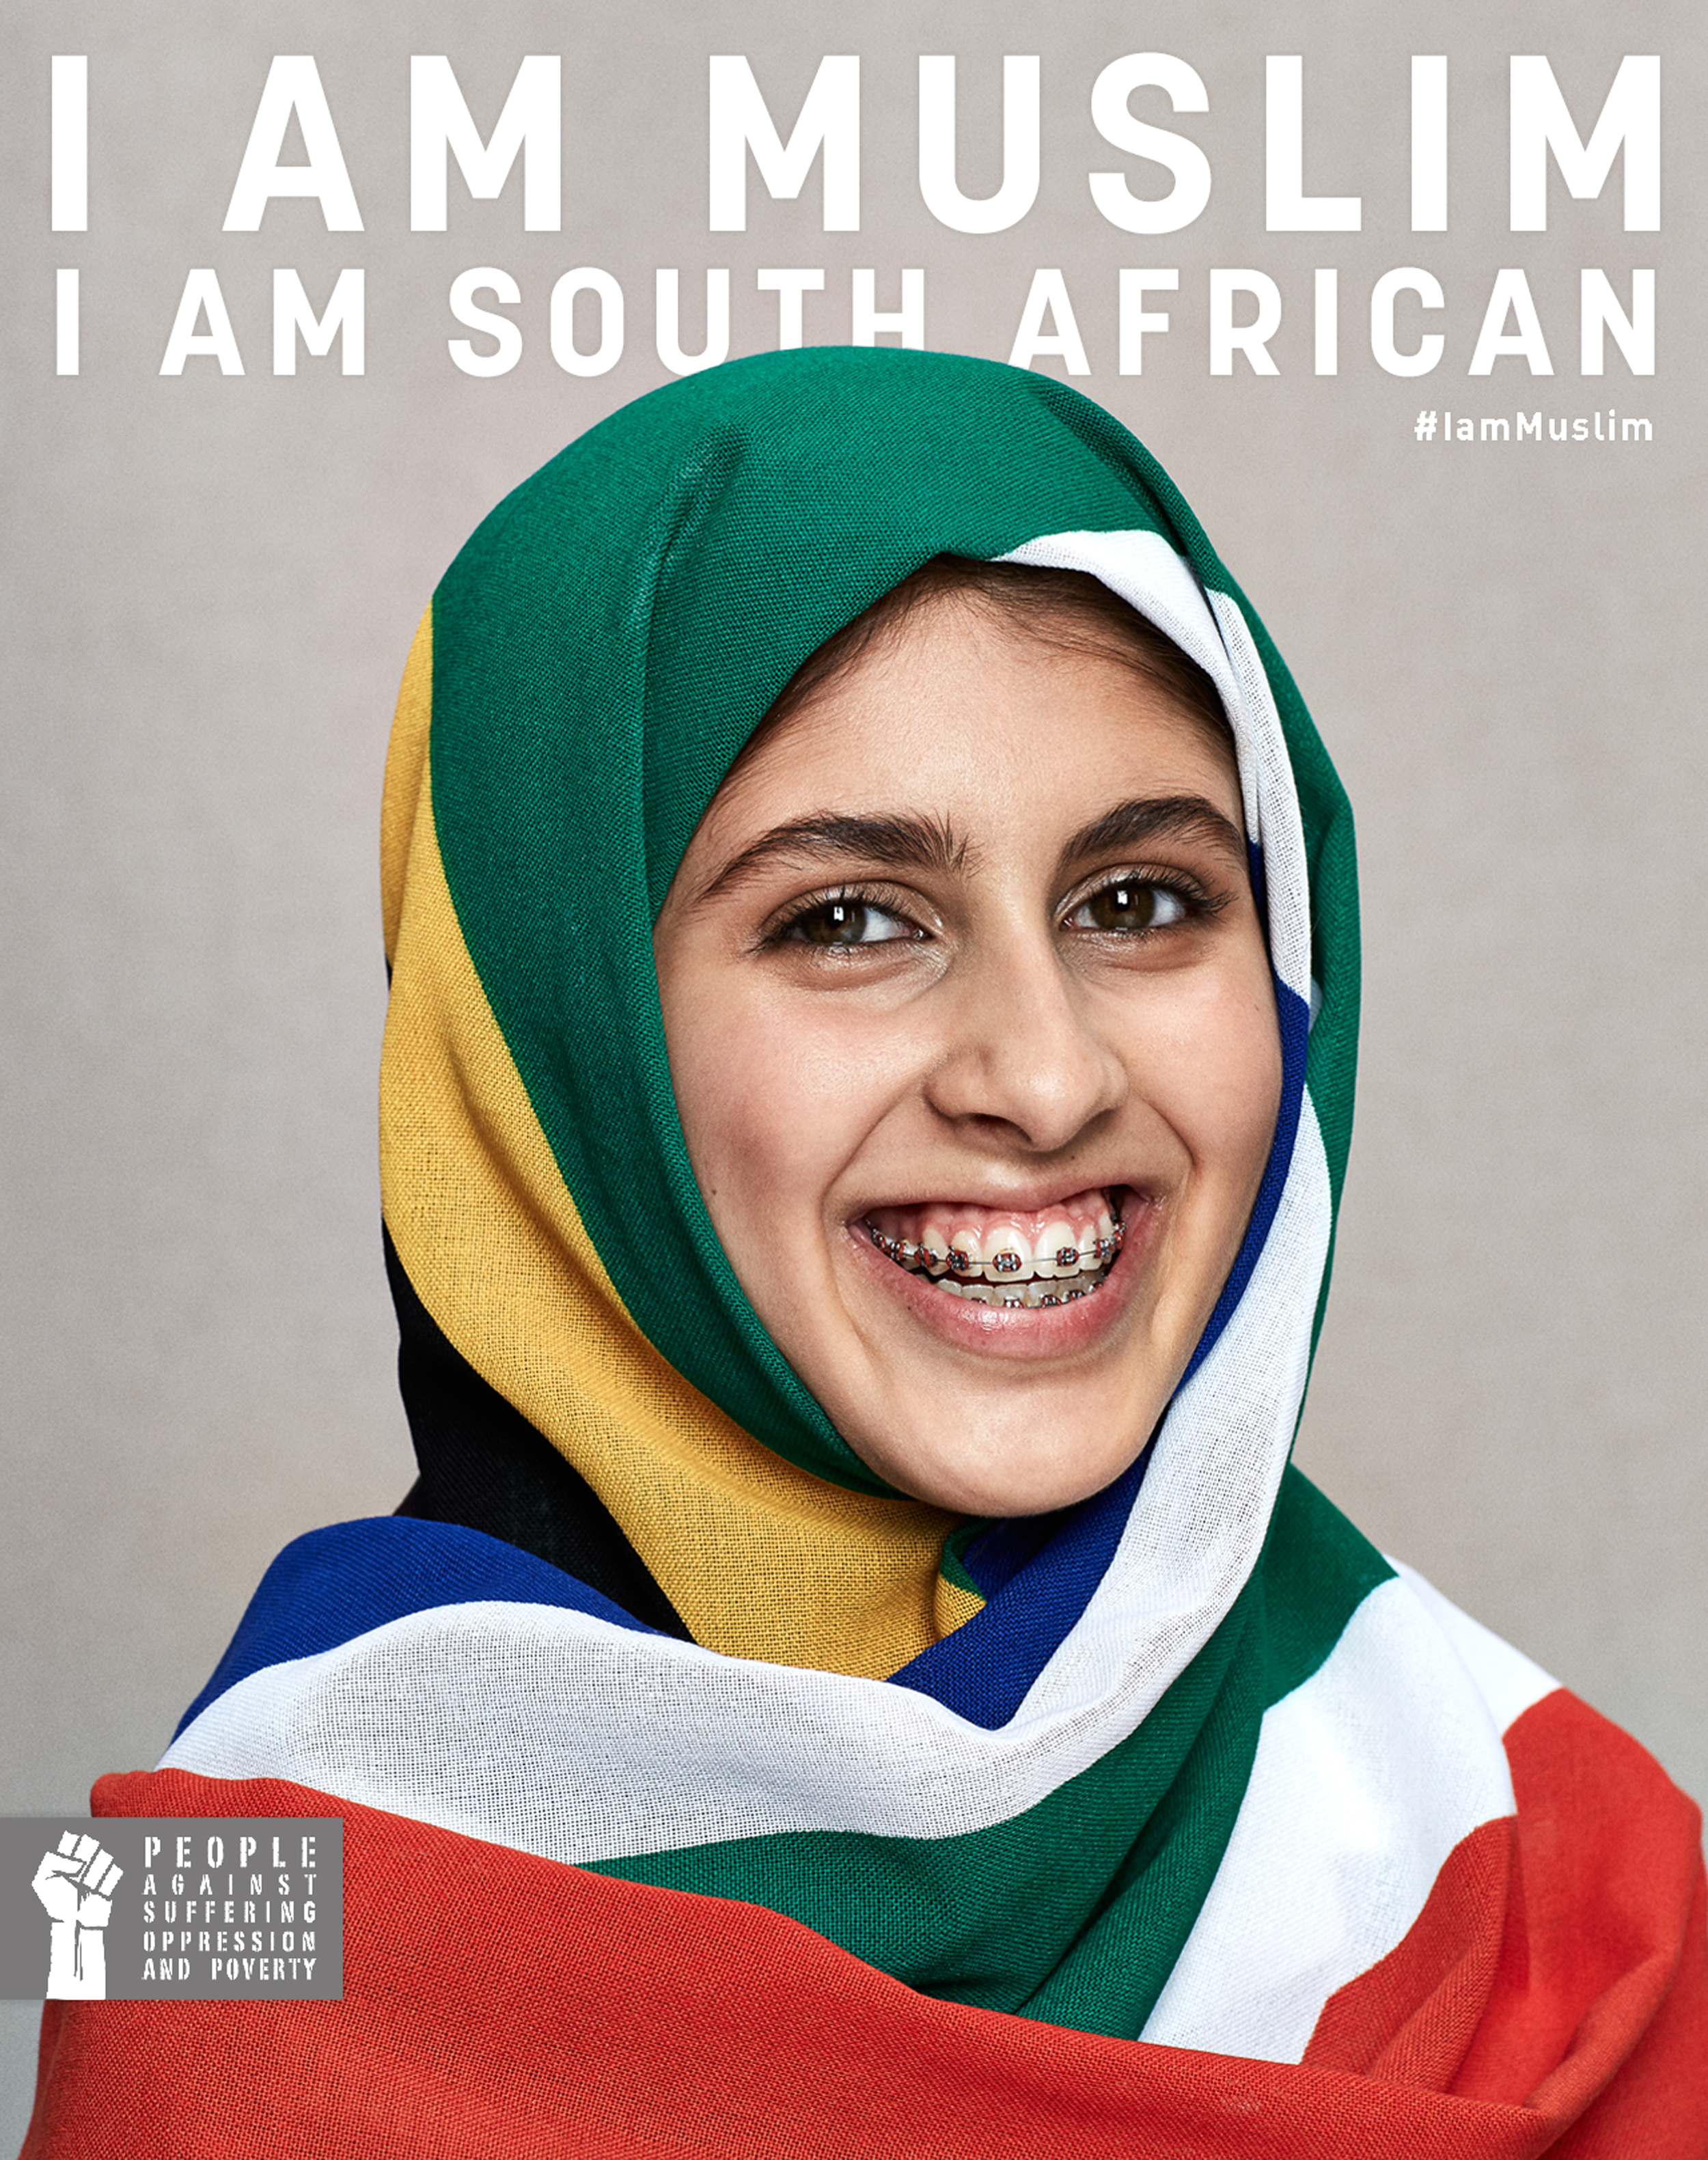 SOUTHAFRICAN_II.jpg